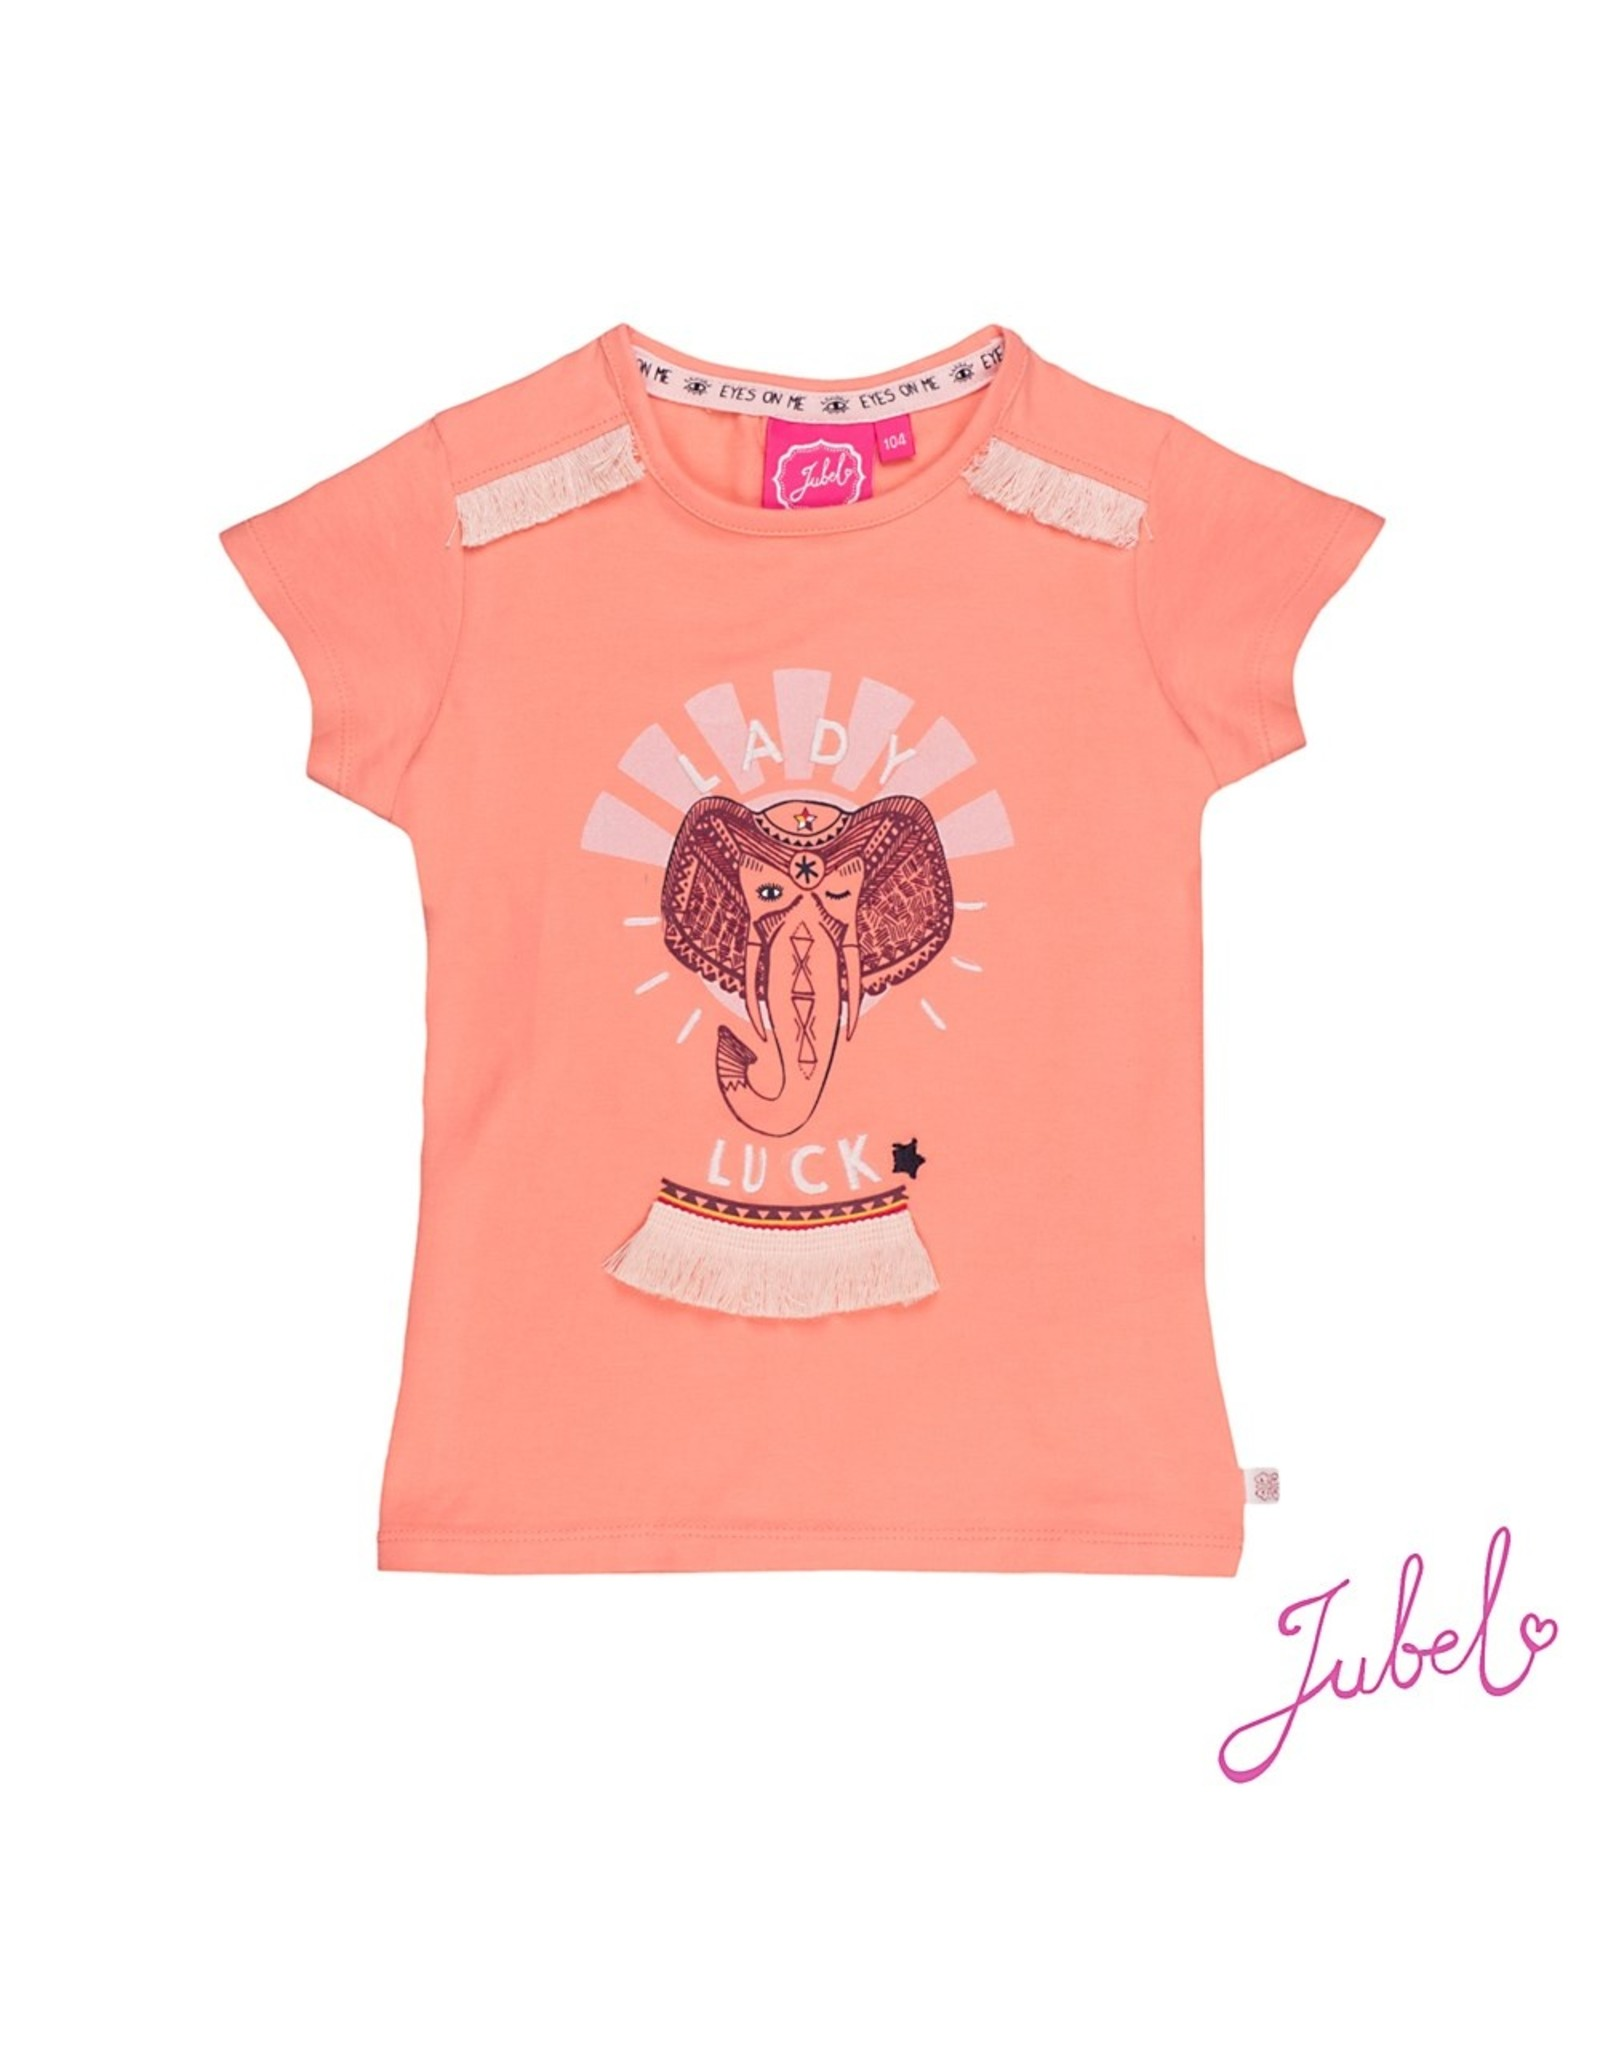 Jubel T-shirt Lady Luck - Stargazer